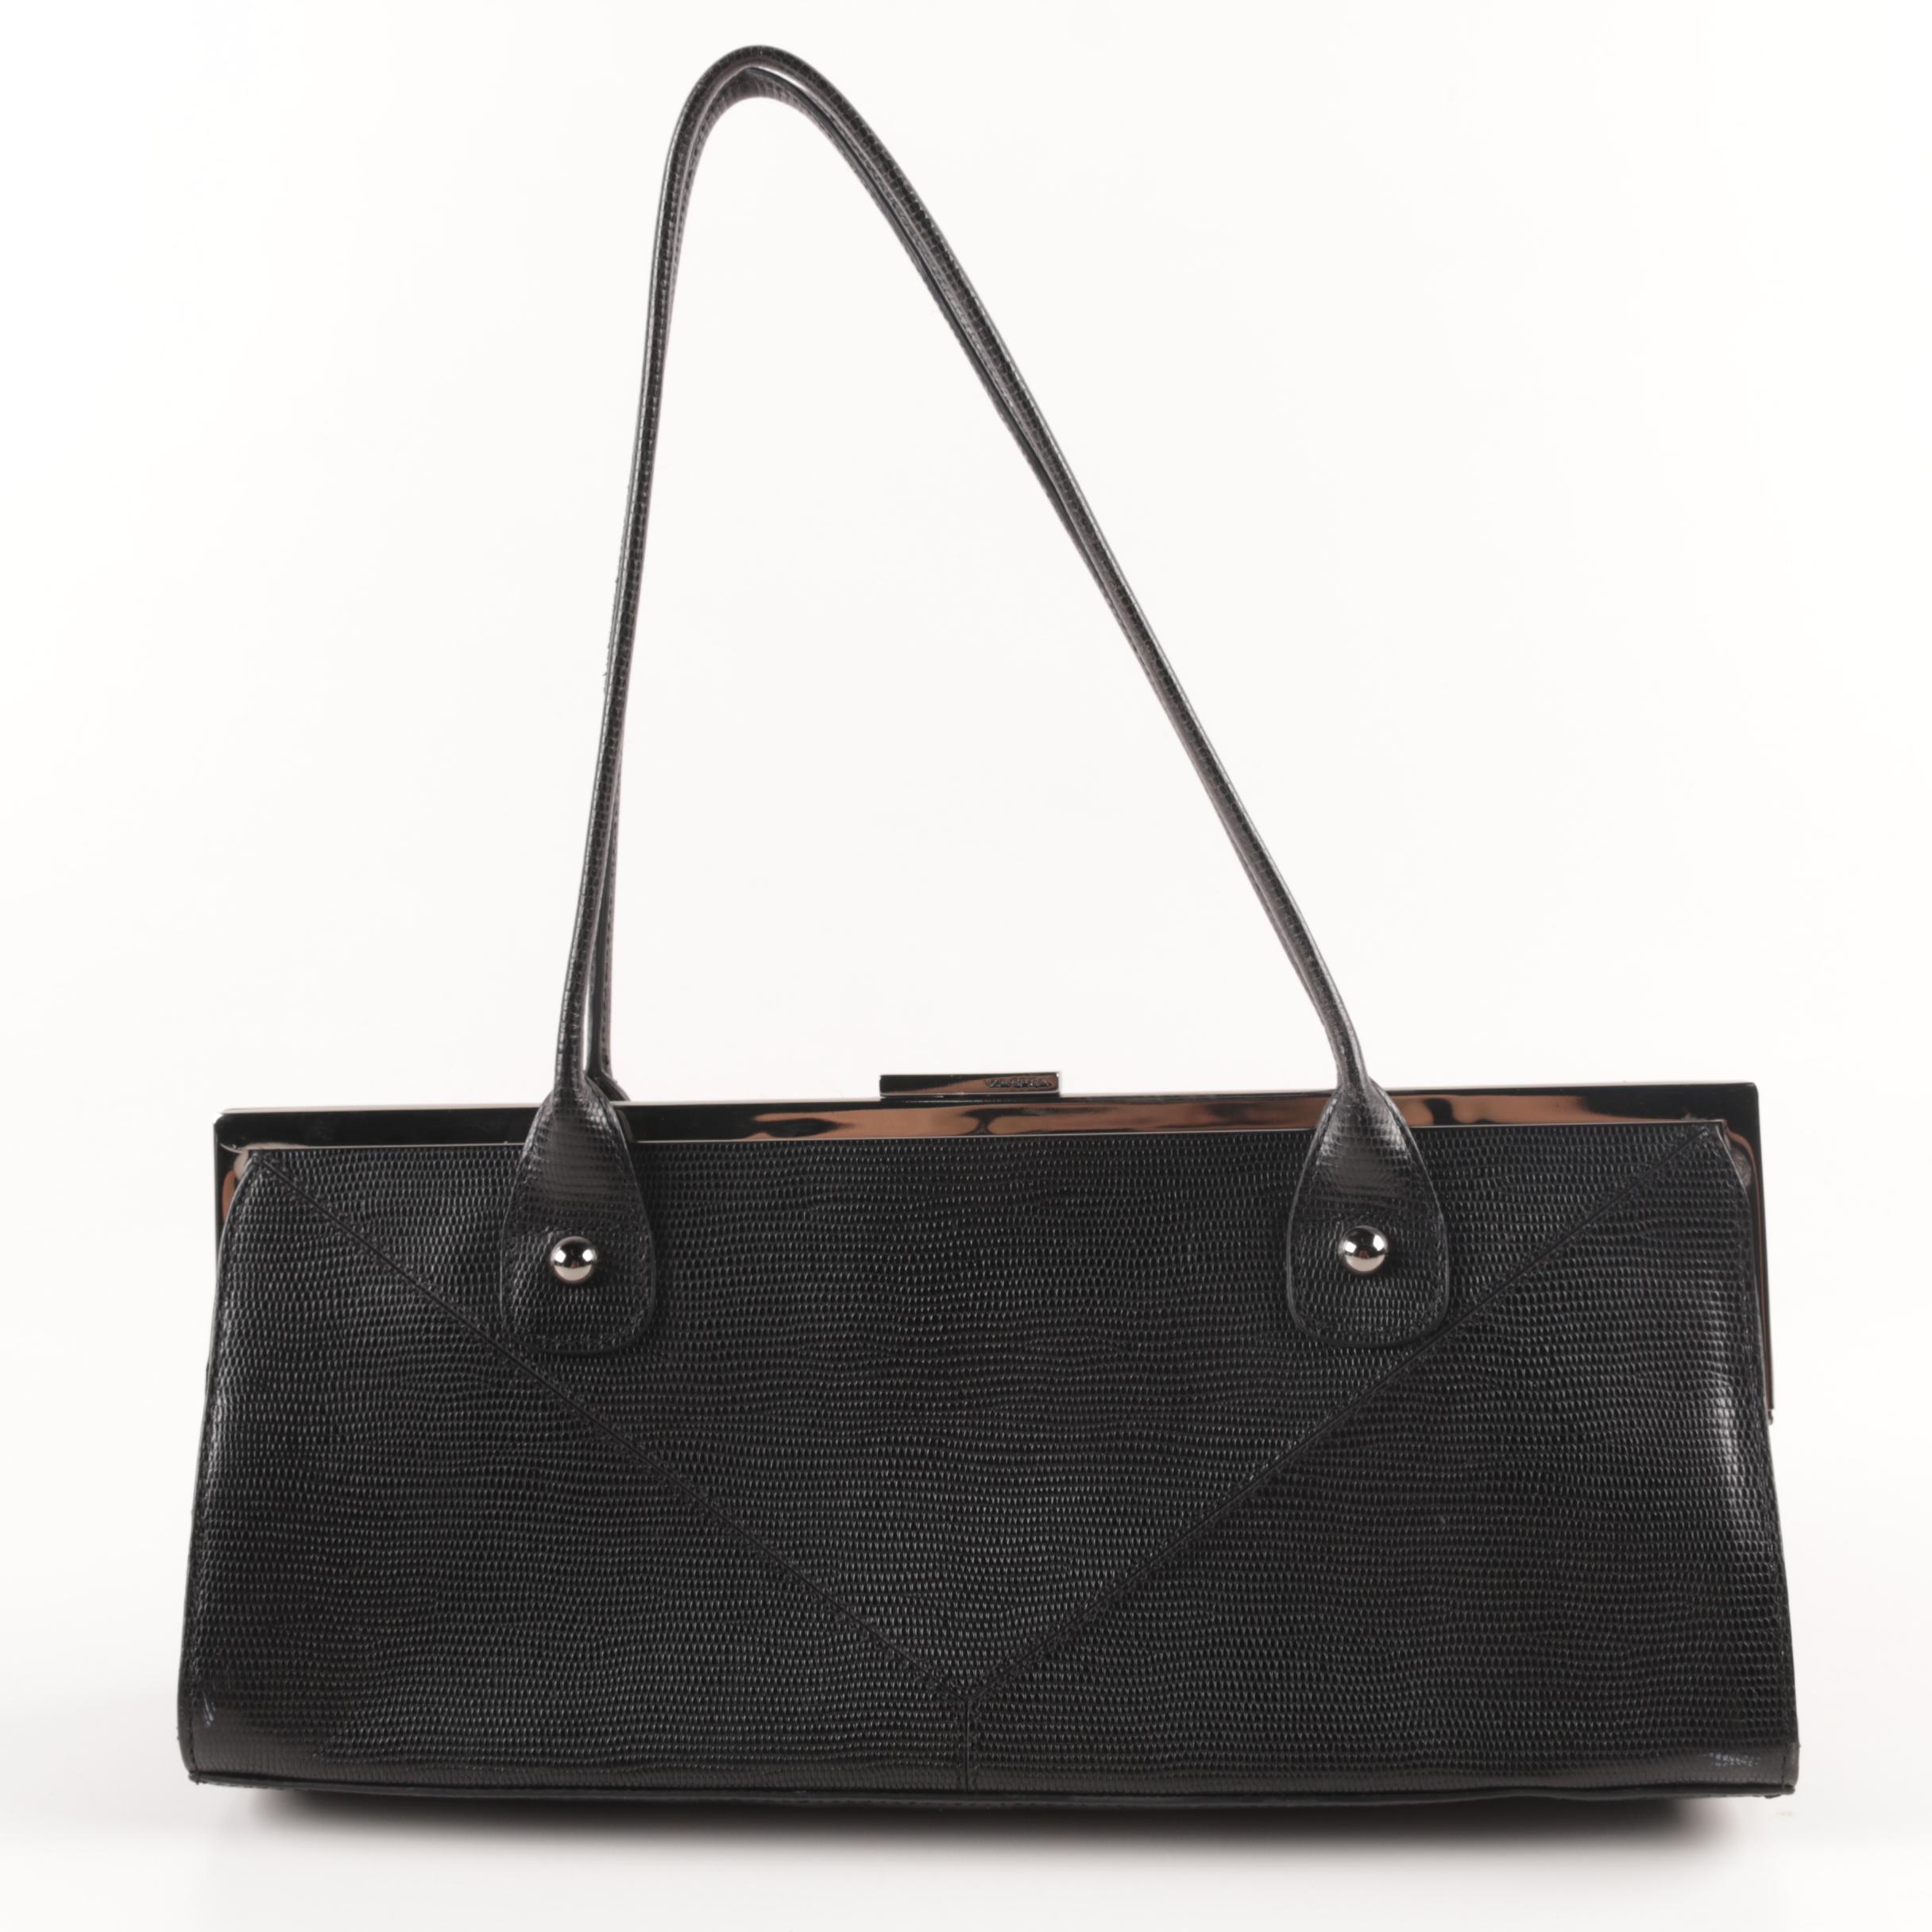 Via Spiga Black Leather Handbag